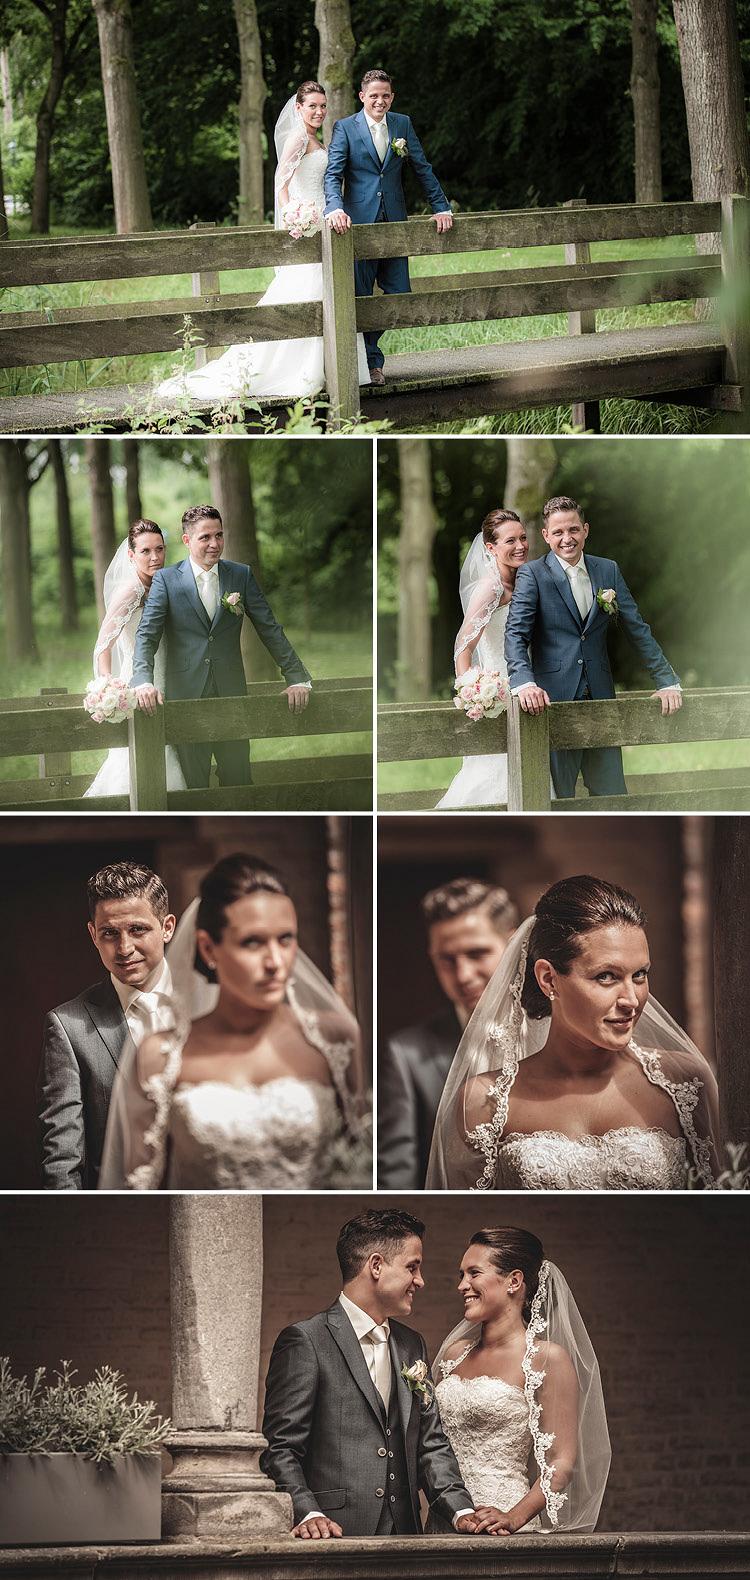 bruidsreportage-blog-willem-nicole-6